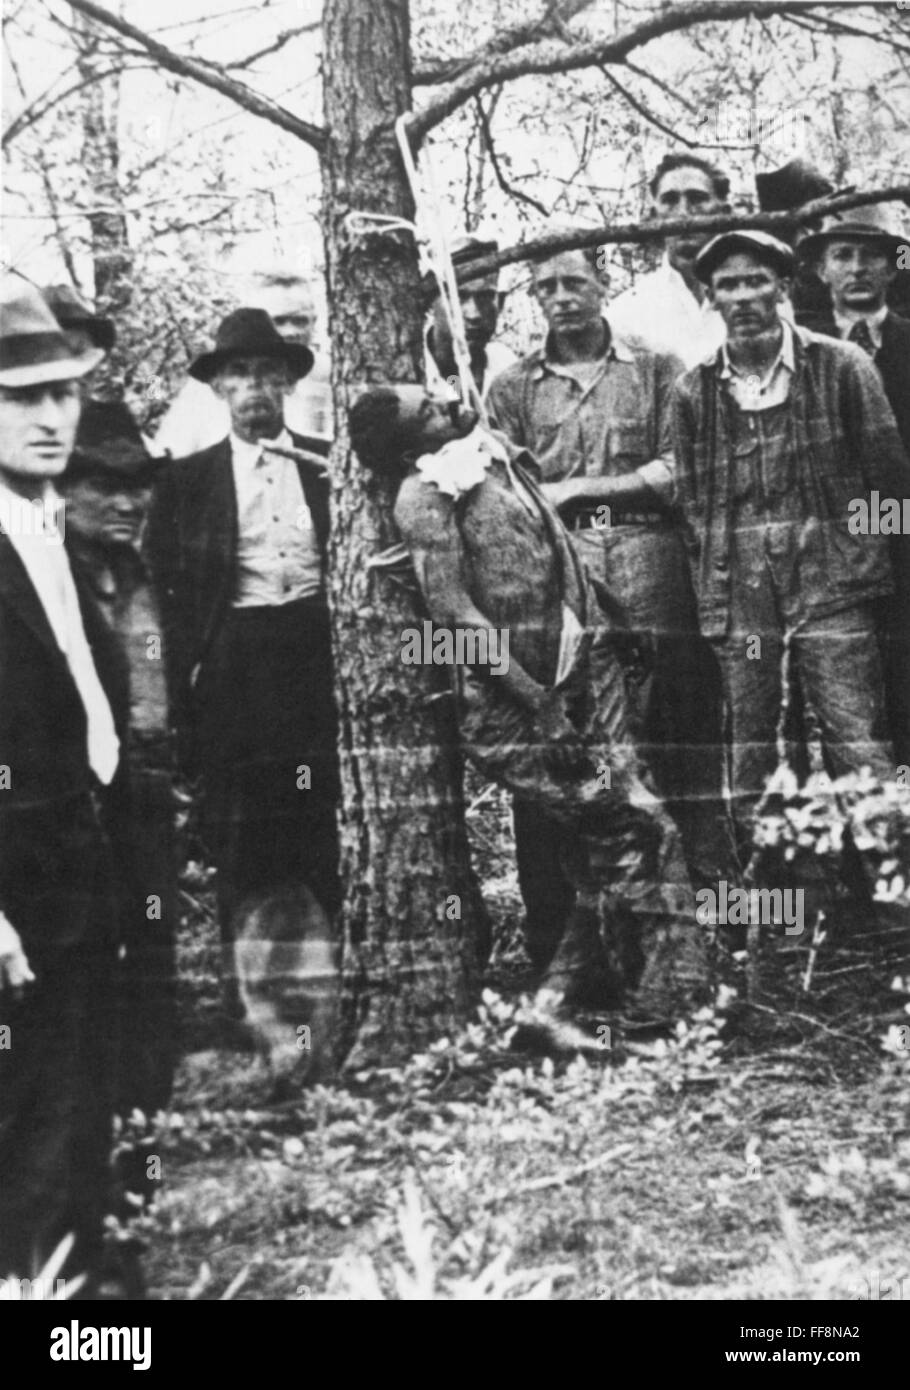 LYNCHING, 1936. /nA lynching in the American South, 1936. Stock Photo